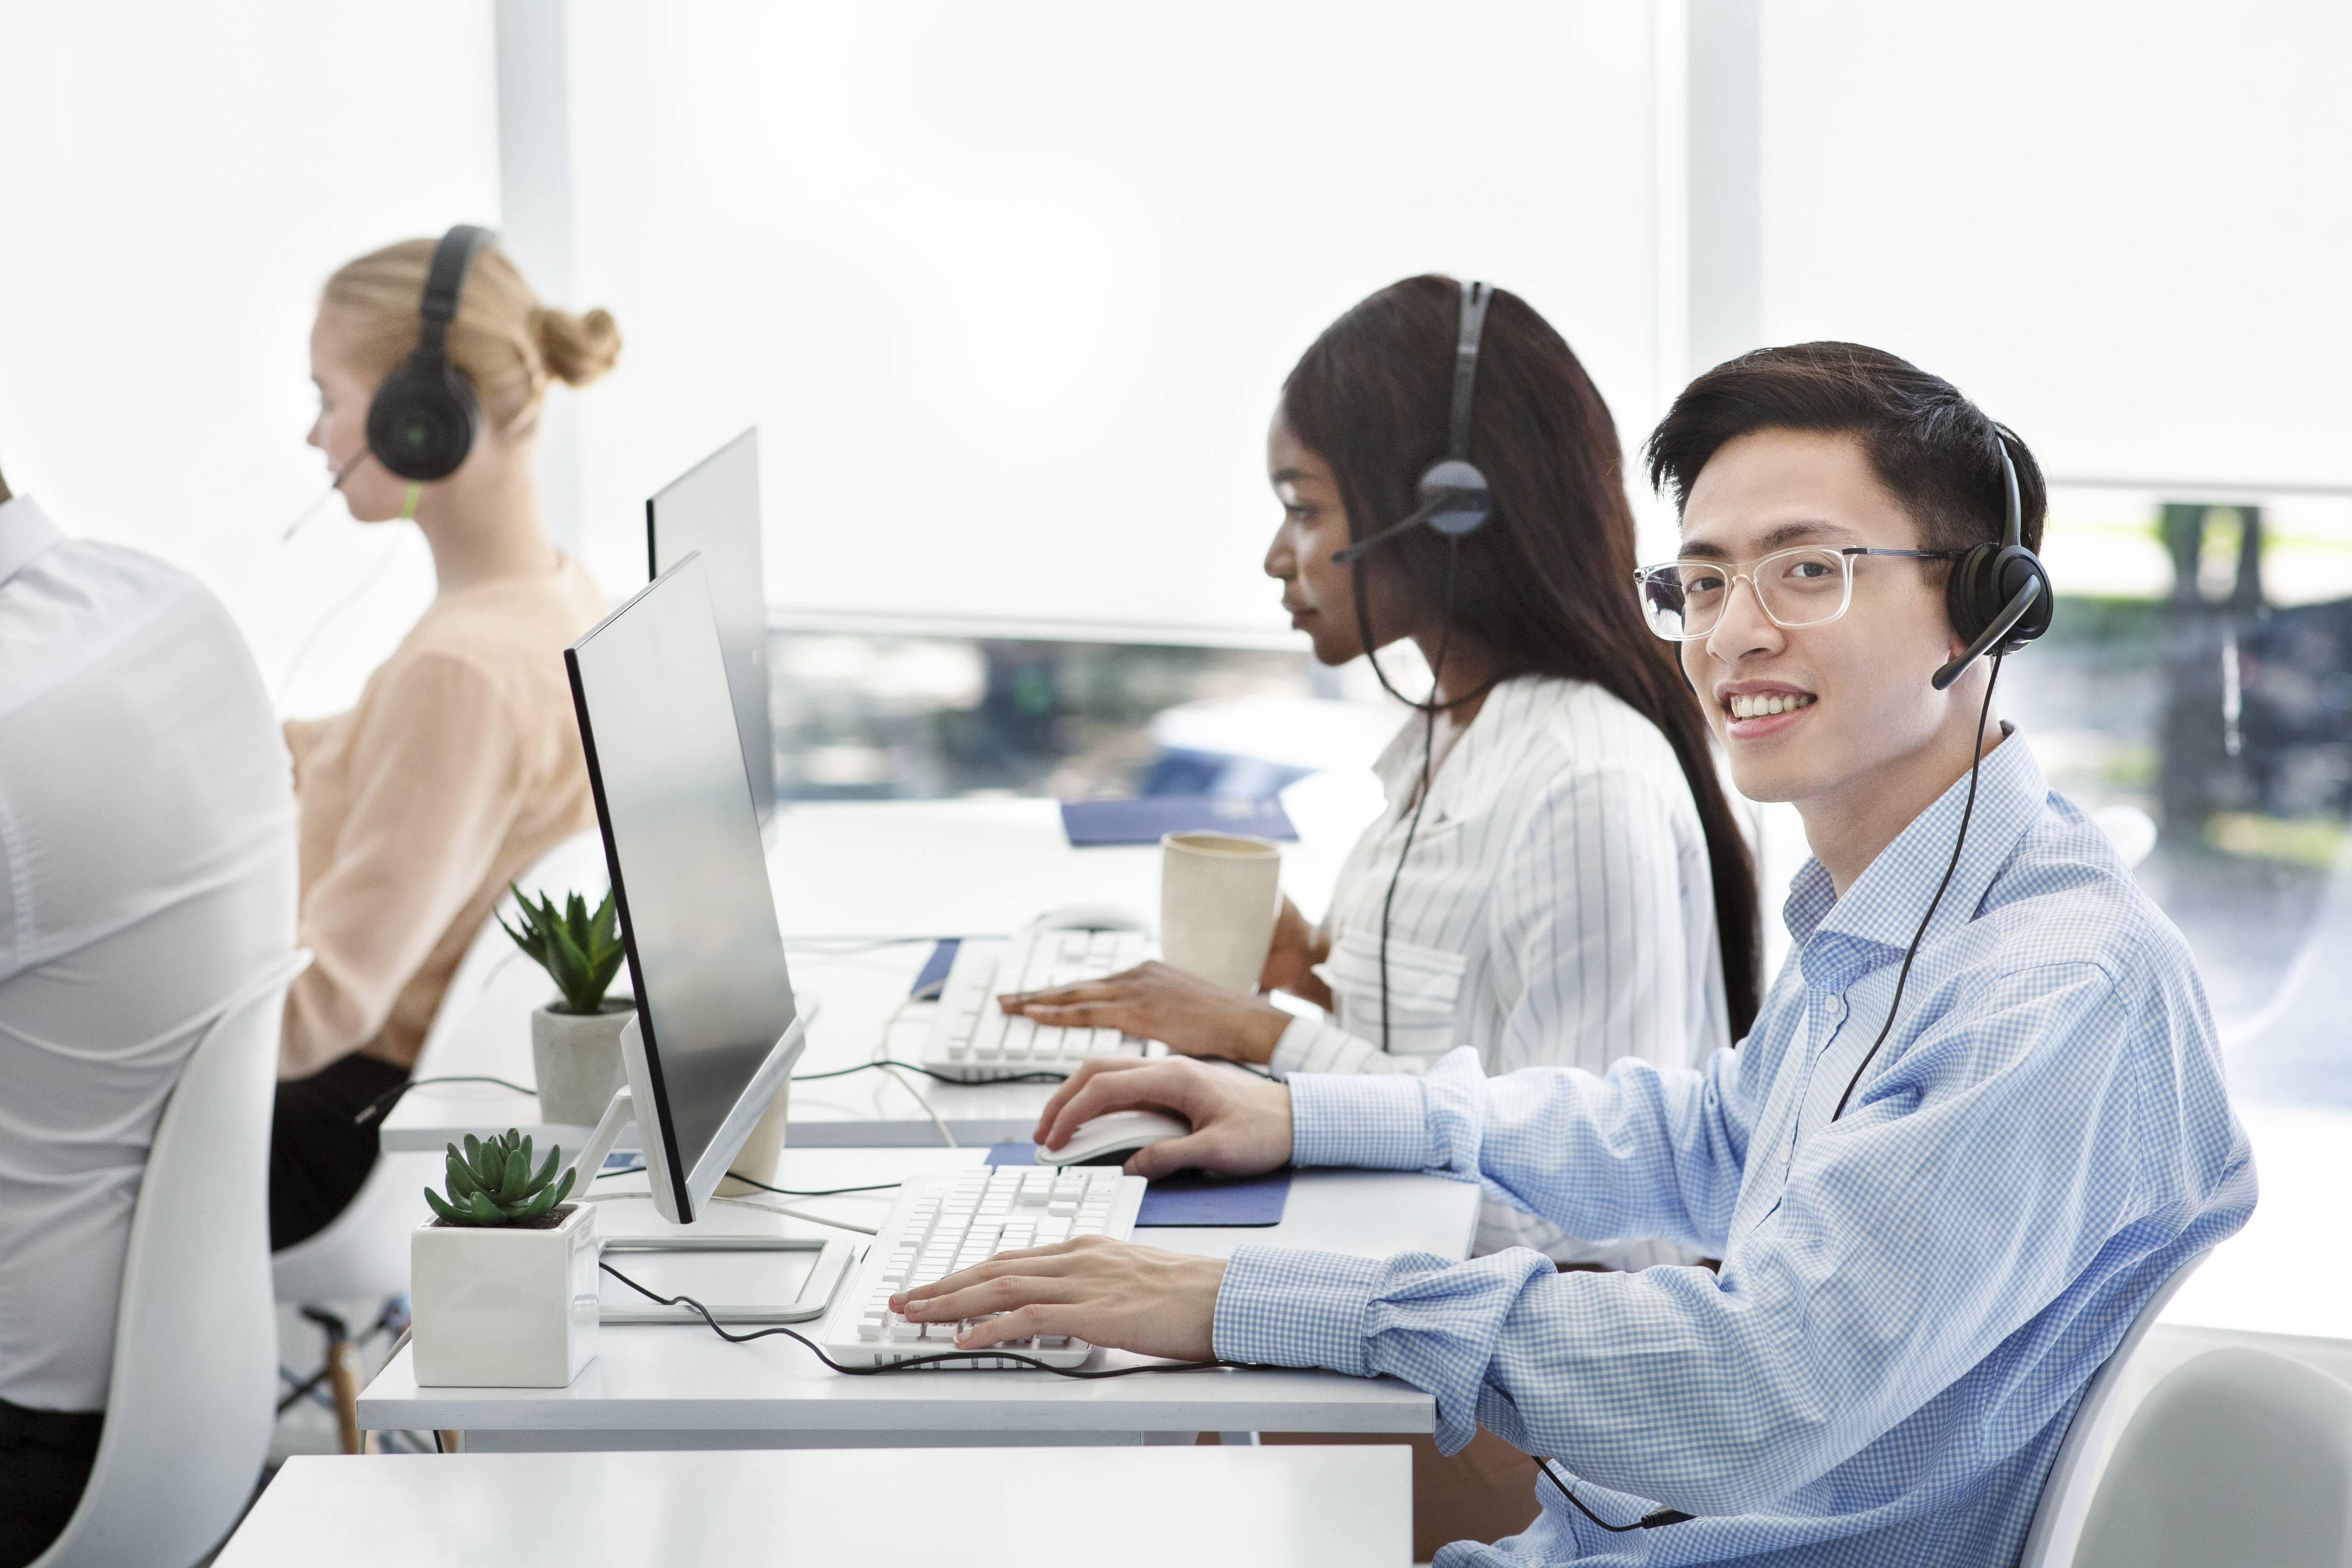 PrestaShop vs BigCommerce Regarding Customer Support & Technical Support